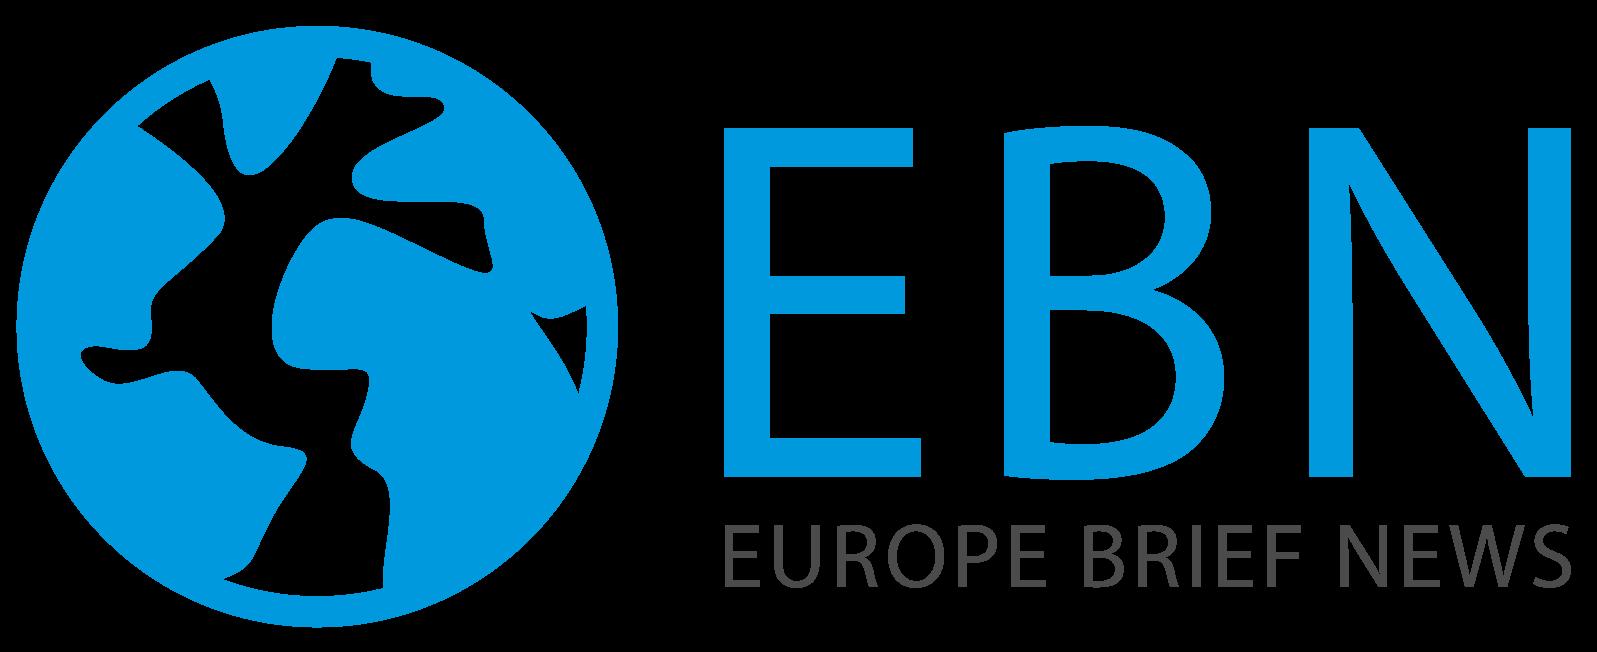 Europe Brief News